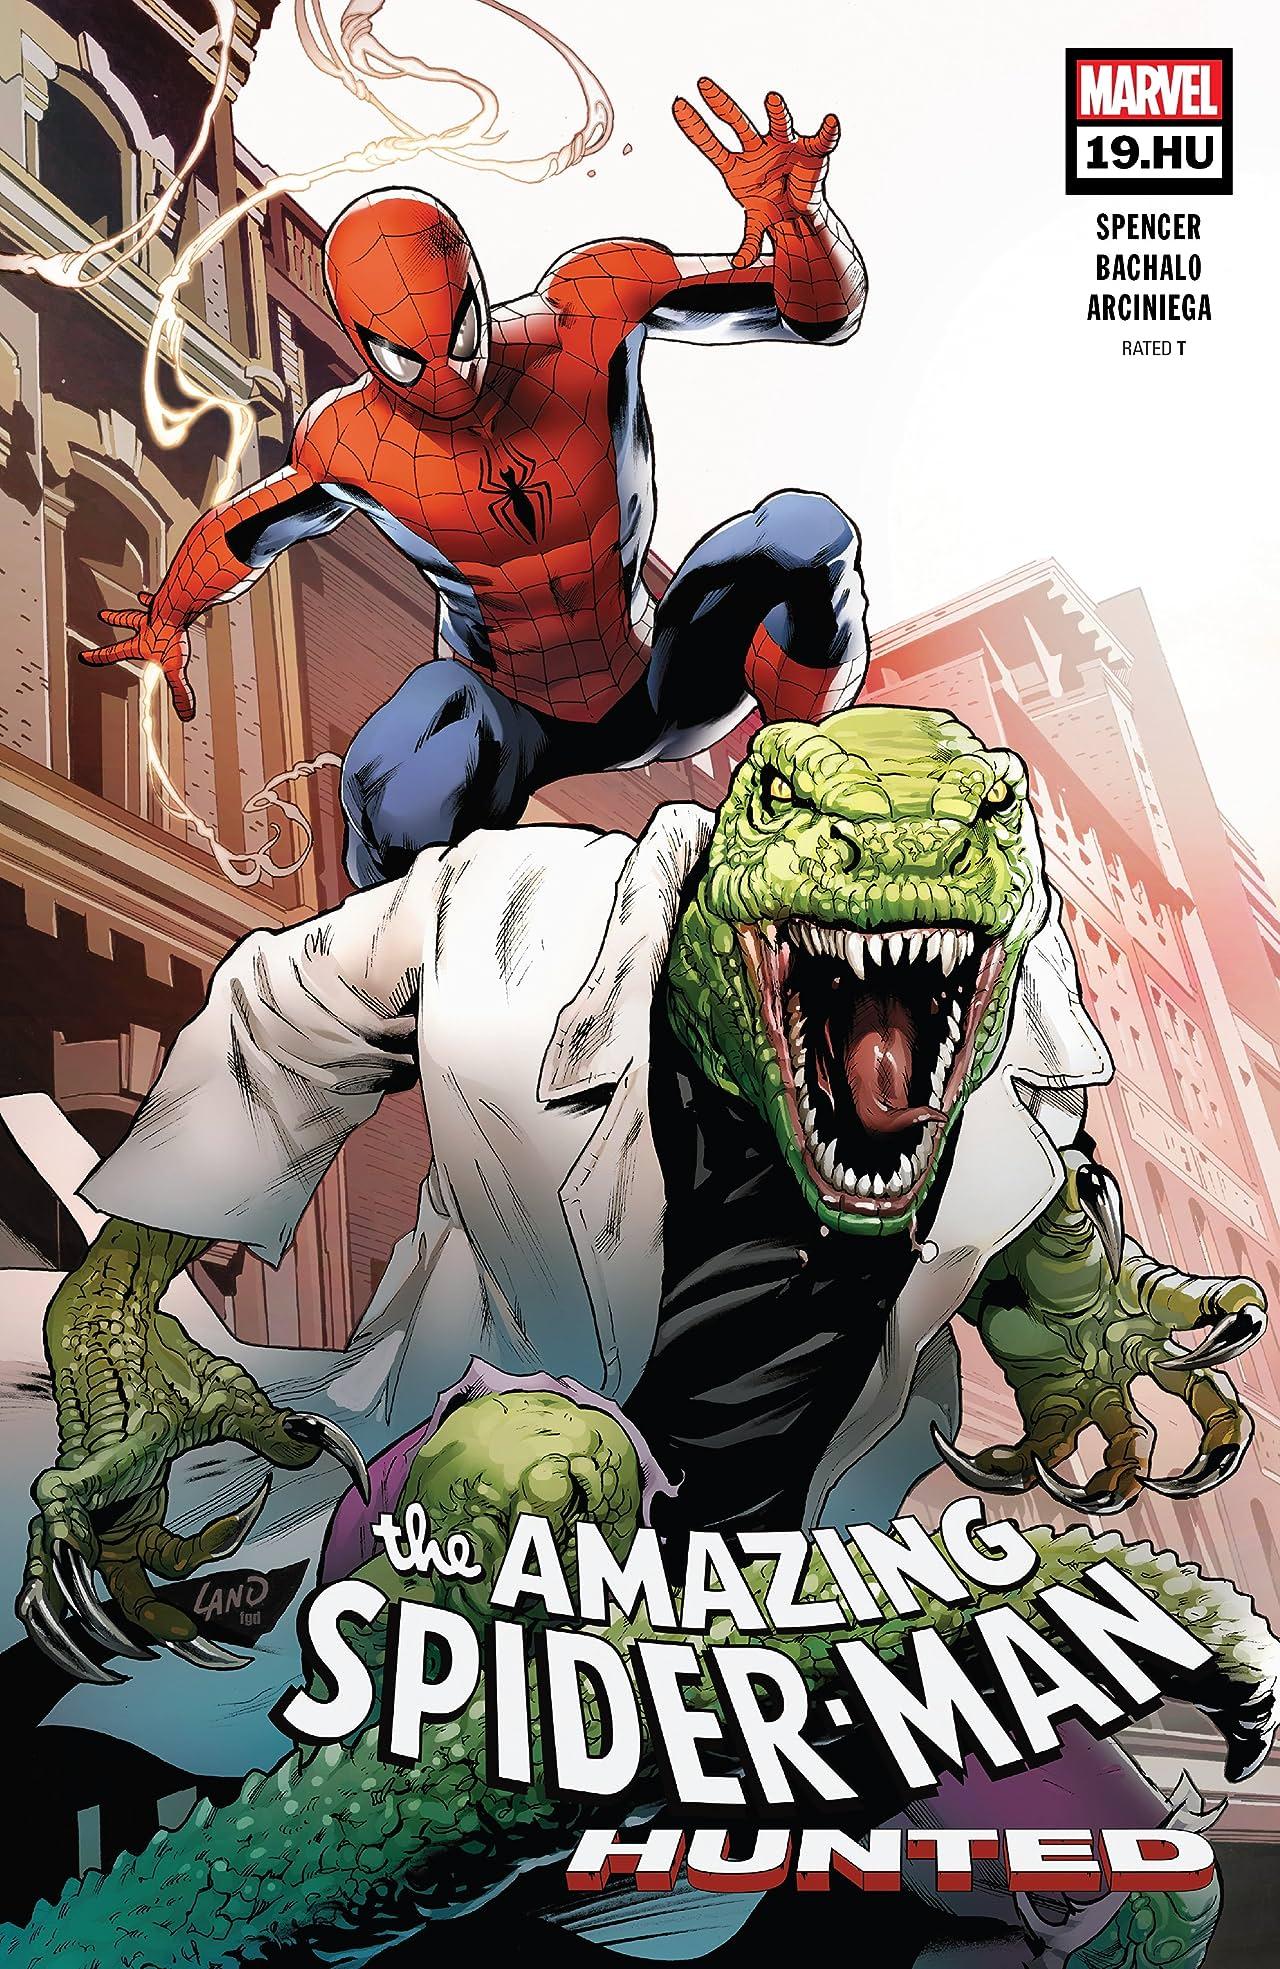 Amazing Spider-Man (2018-) No.19.HU